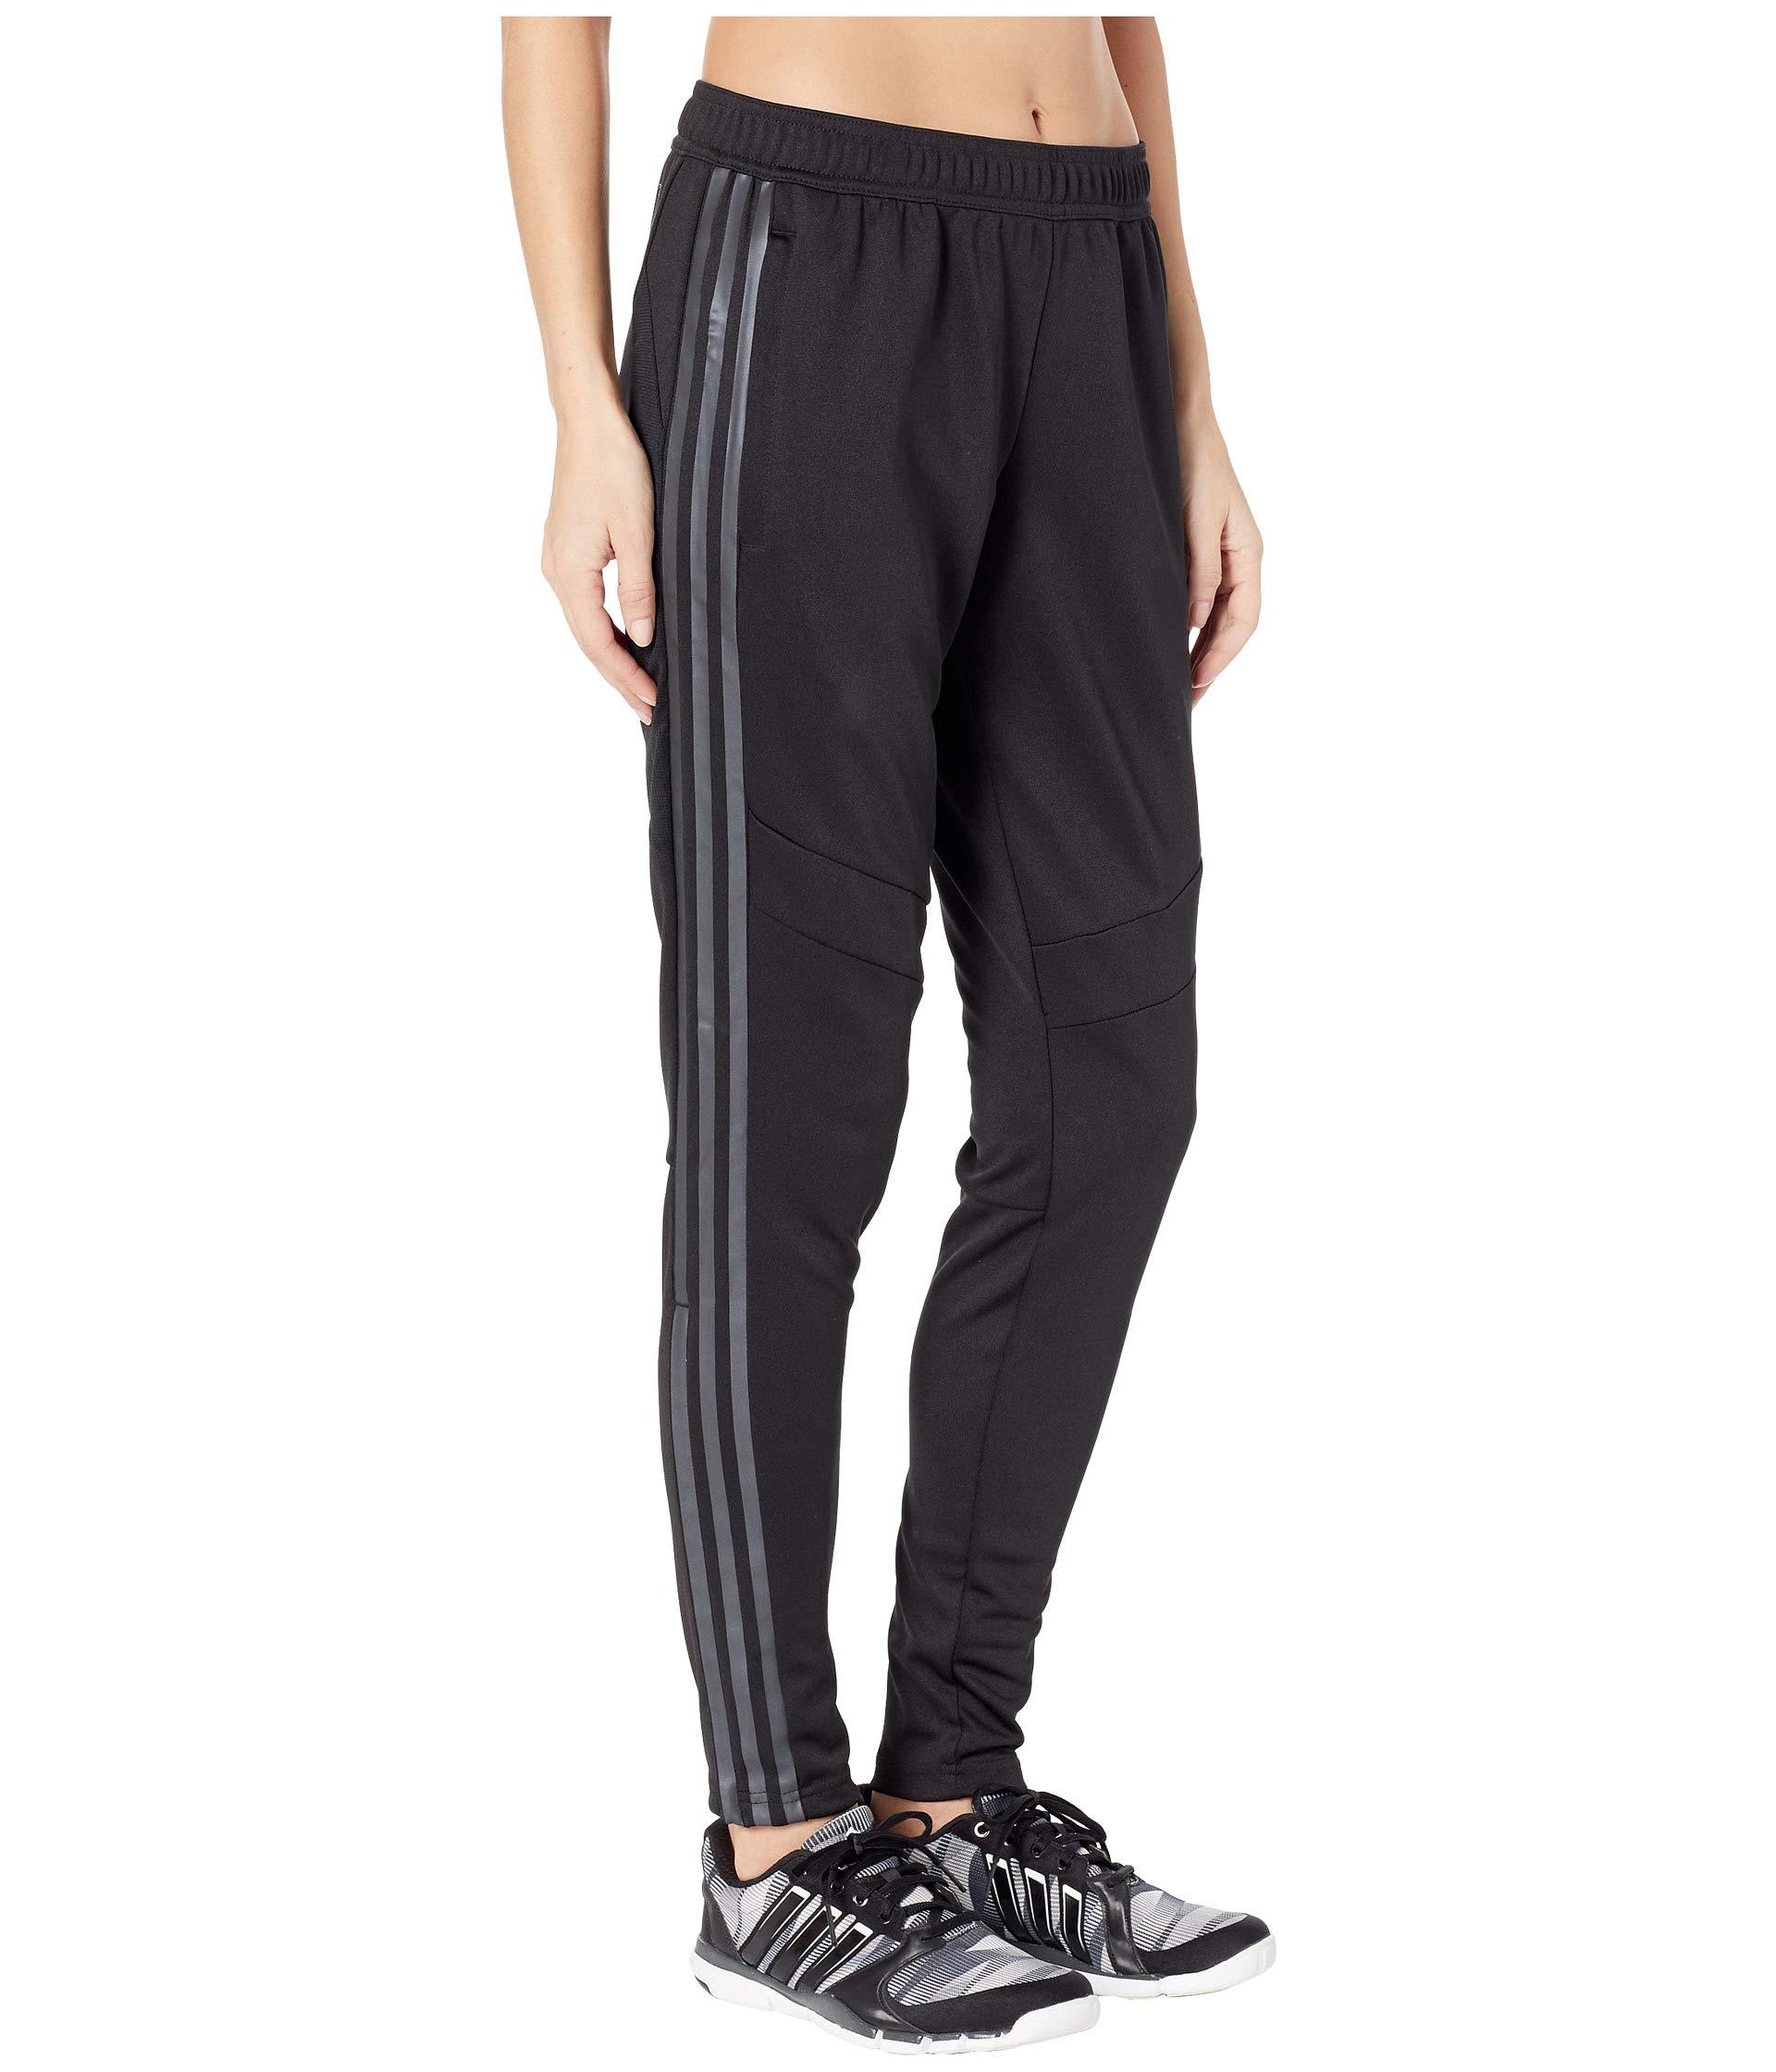 adidas Women's Soccer Tiro 19 Training Pant, XX-Small by adidas (Image #5)